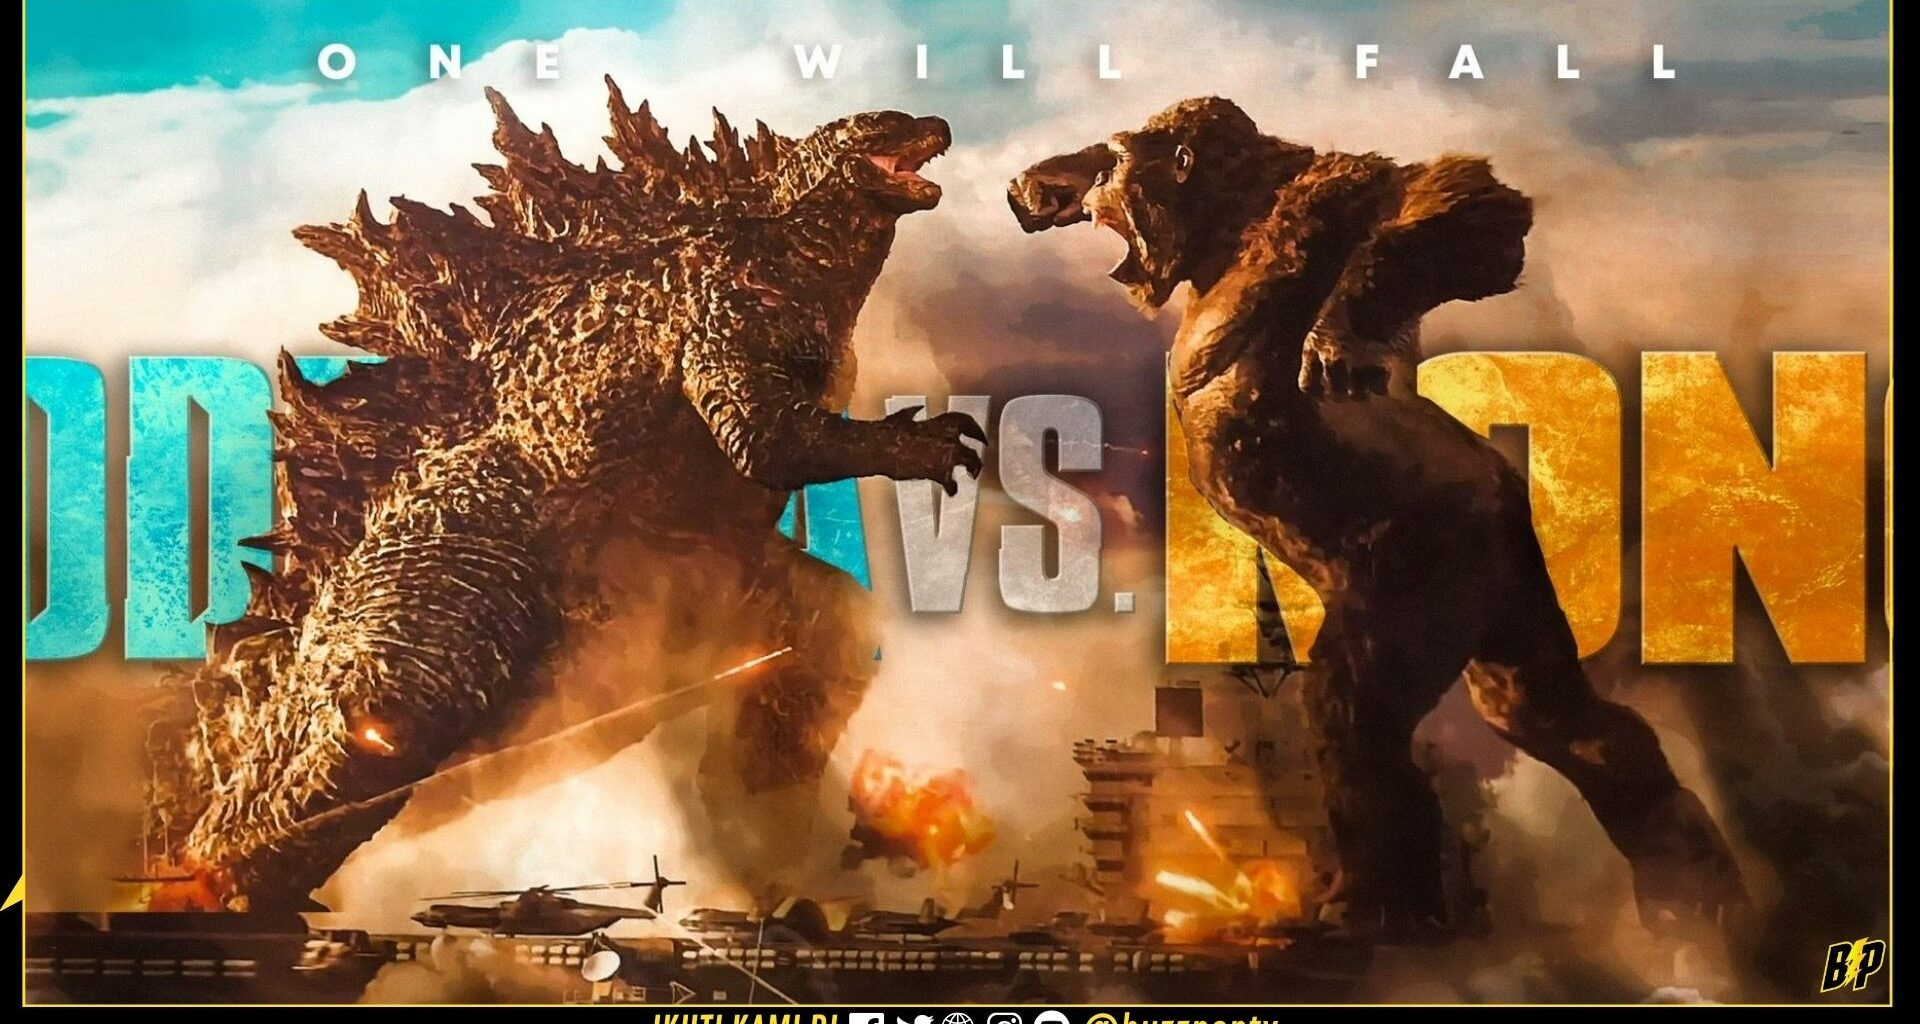 Godzilla Vs Kong banner header